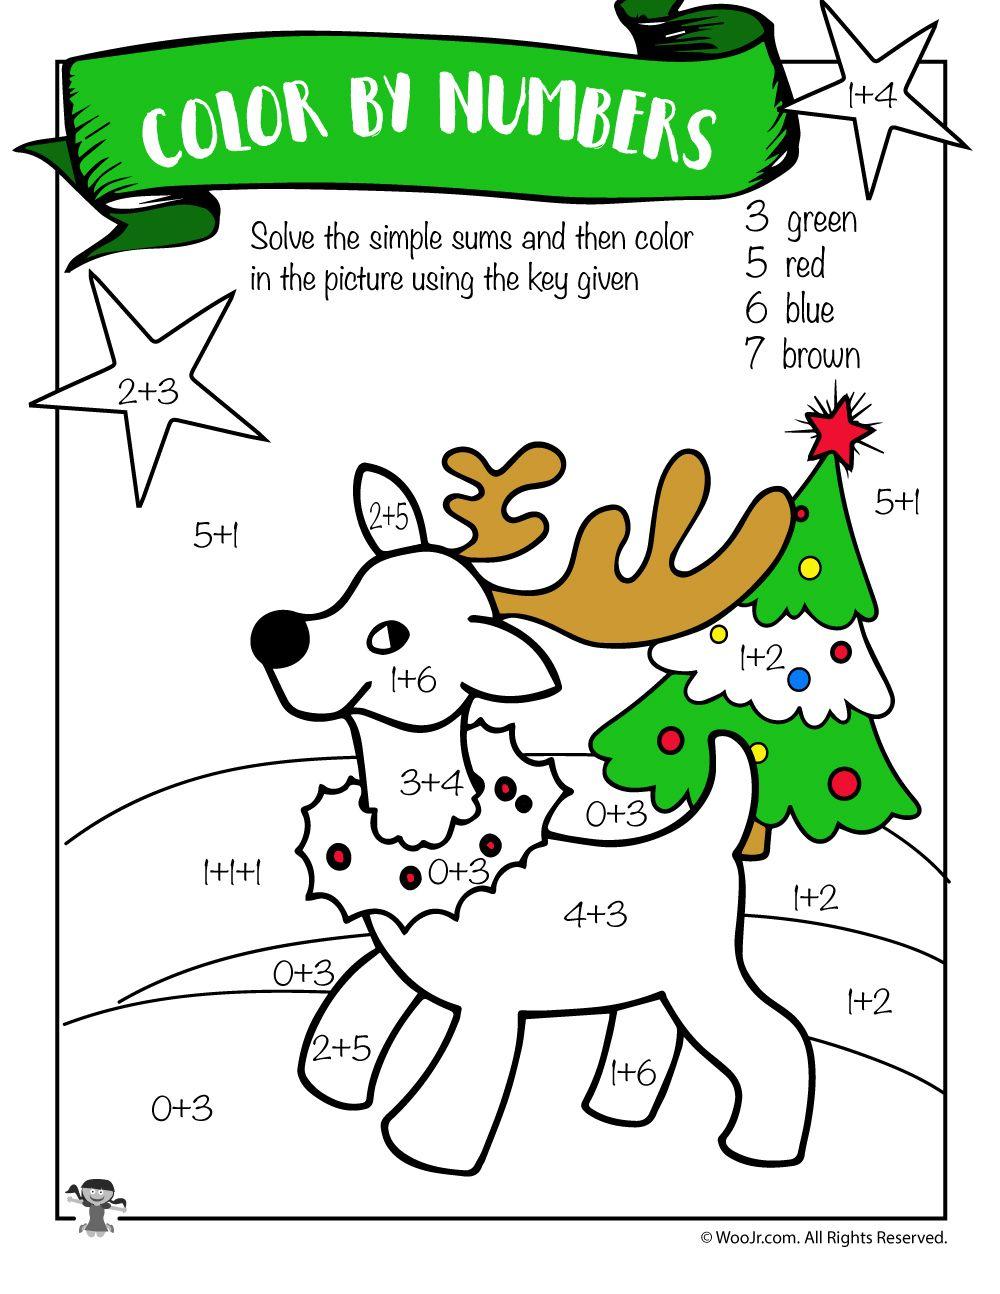 Reindeer Math Addition Coloring Worksheet   Woo! Jr. Kids Activities   Addition  coloring worksheet [ 1294 x 1000 Pixel ]